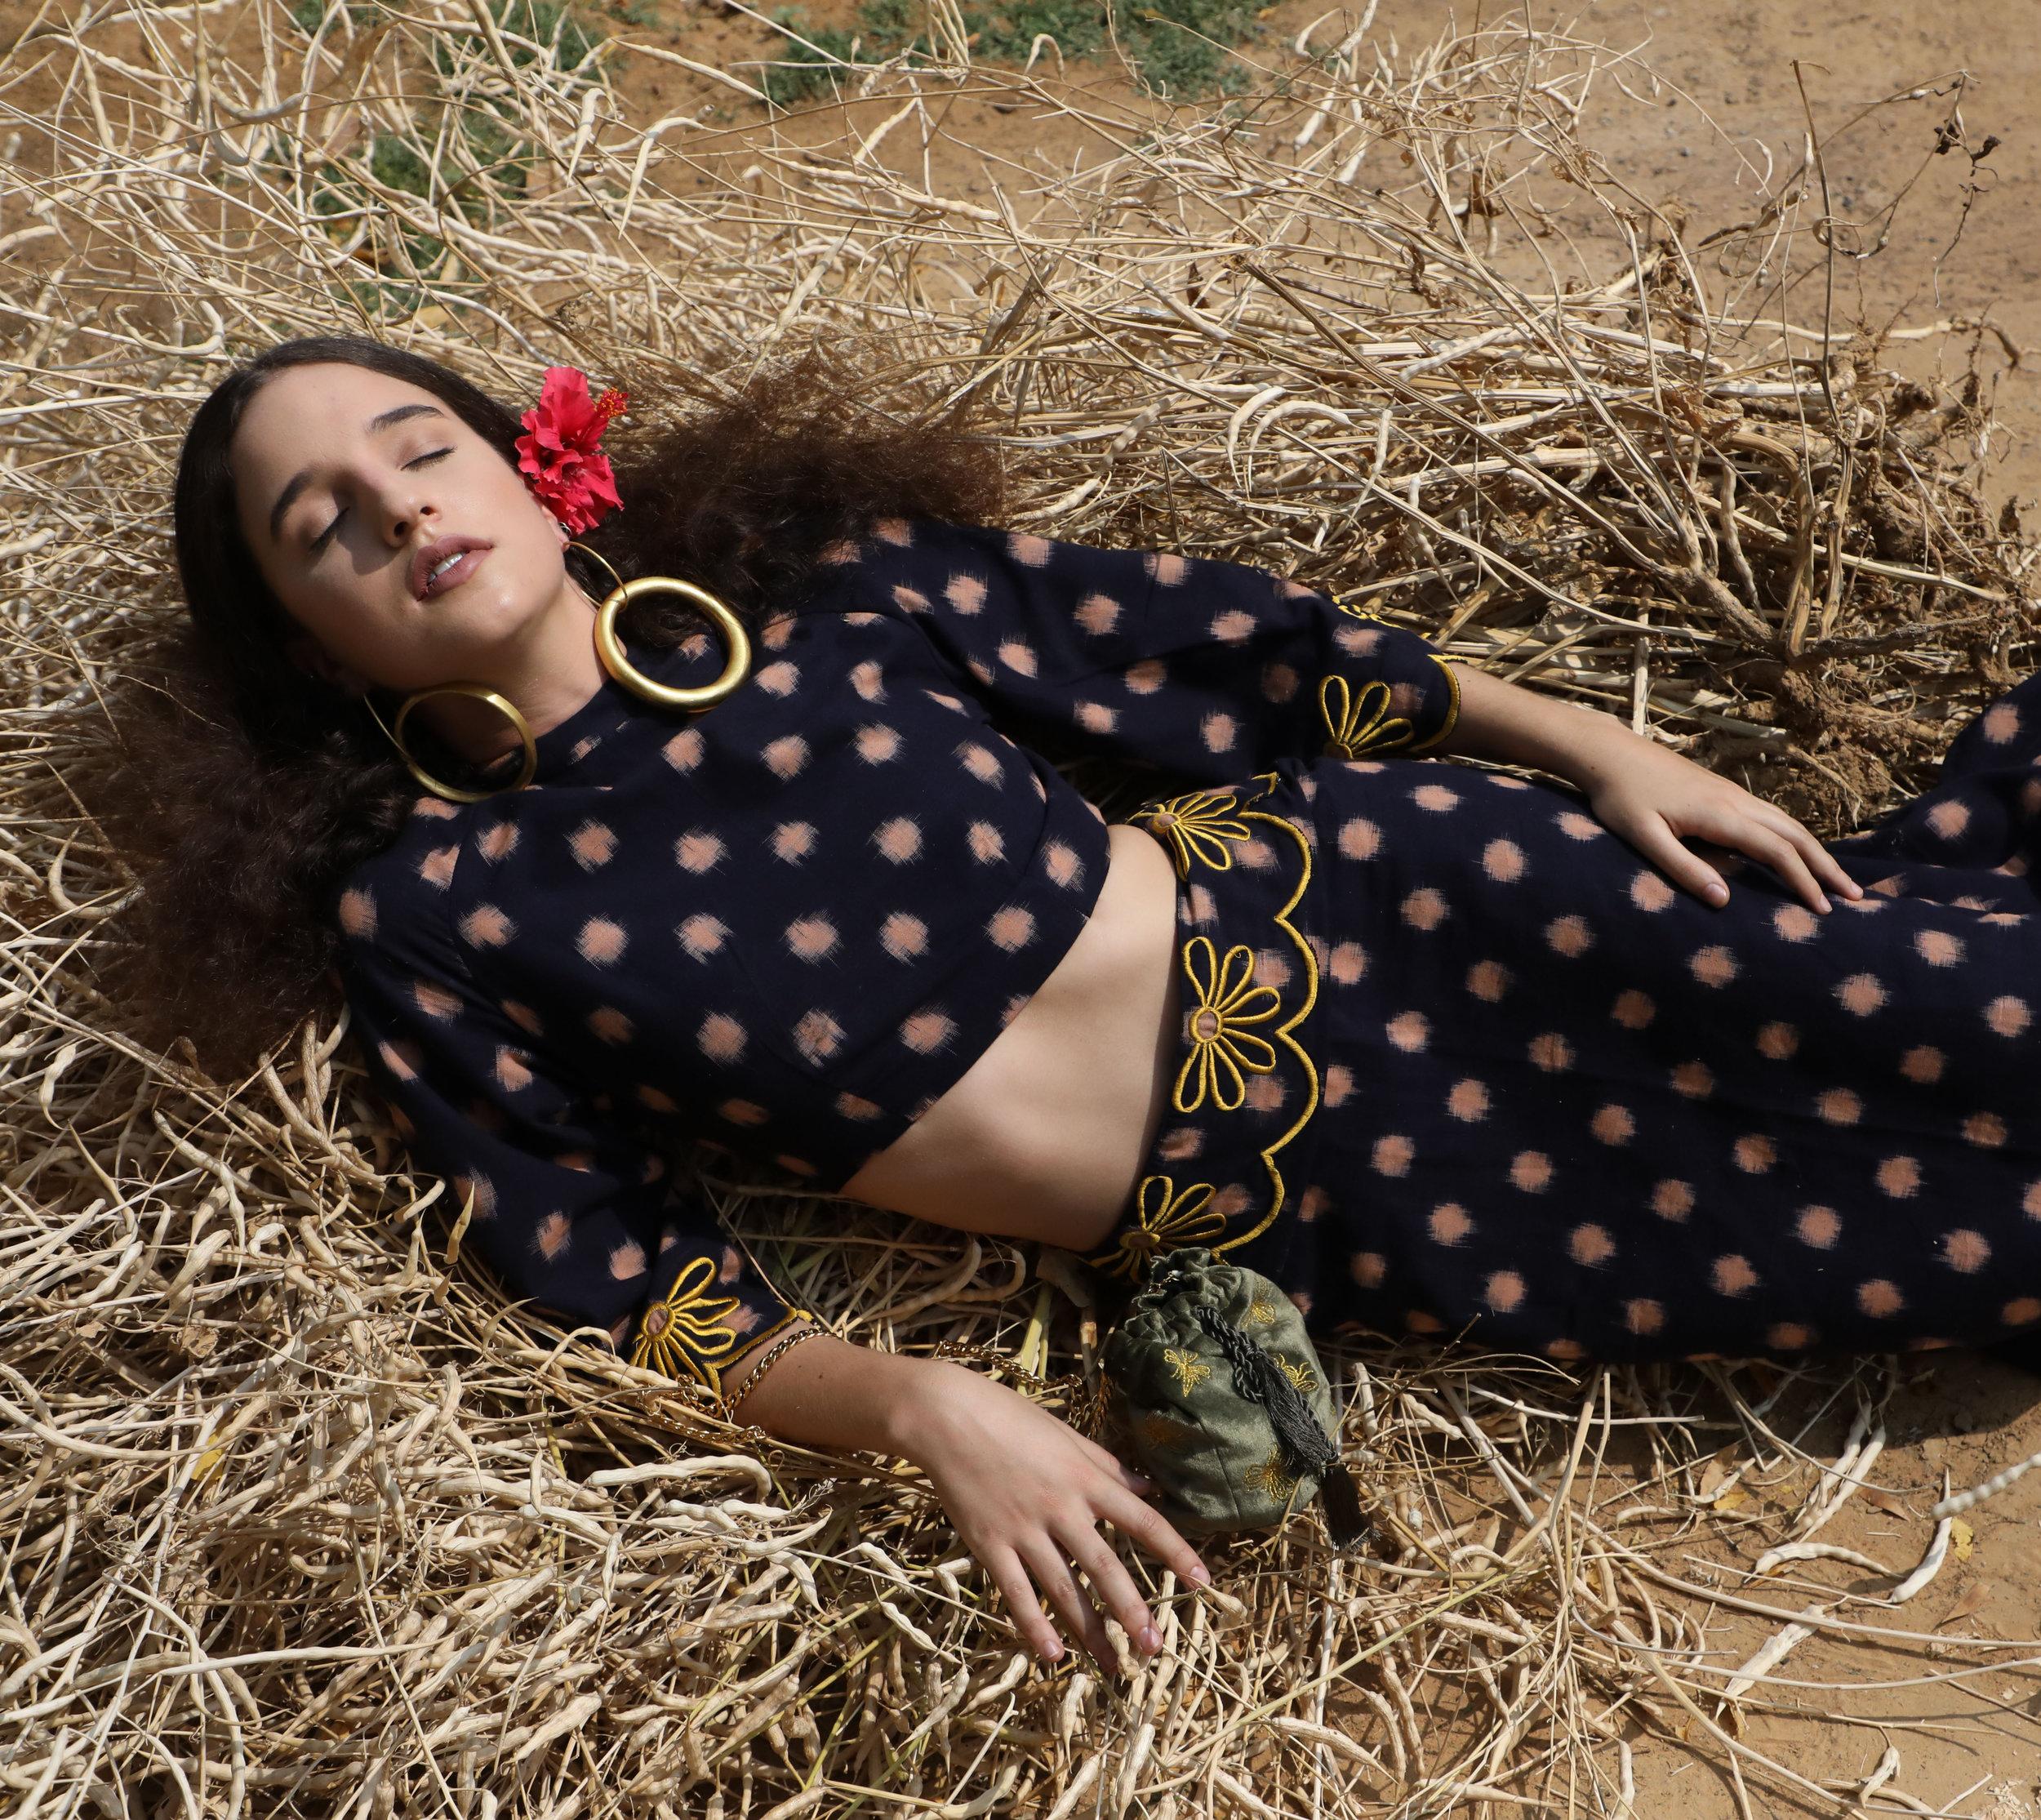 De Castro Moda_Jaipur Shooting by Lodoclick 14-03-18 (174).jpg